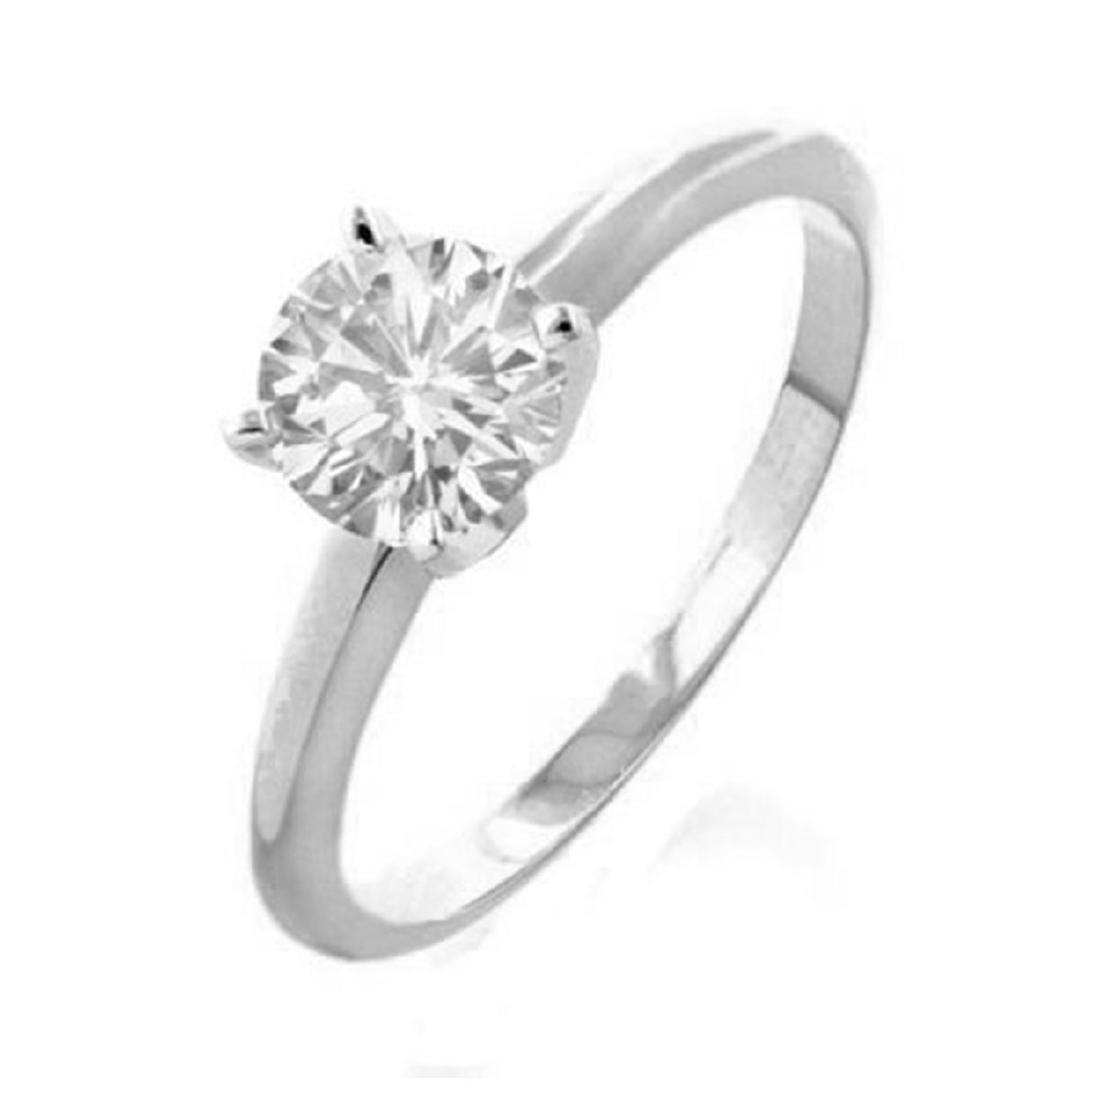 2.0 ctw VS/SI Diamond Solitaire Ring 18K White Gold -